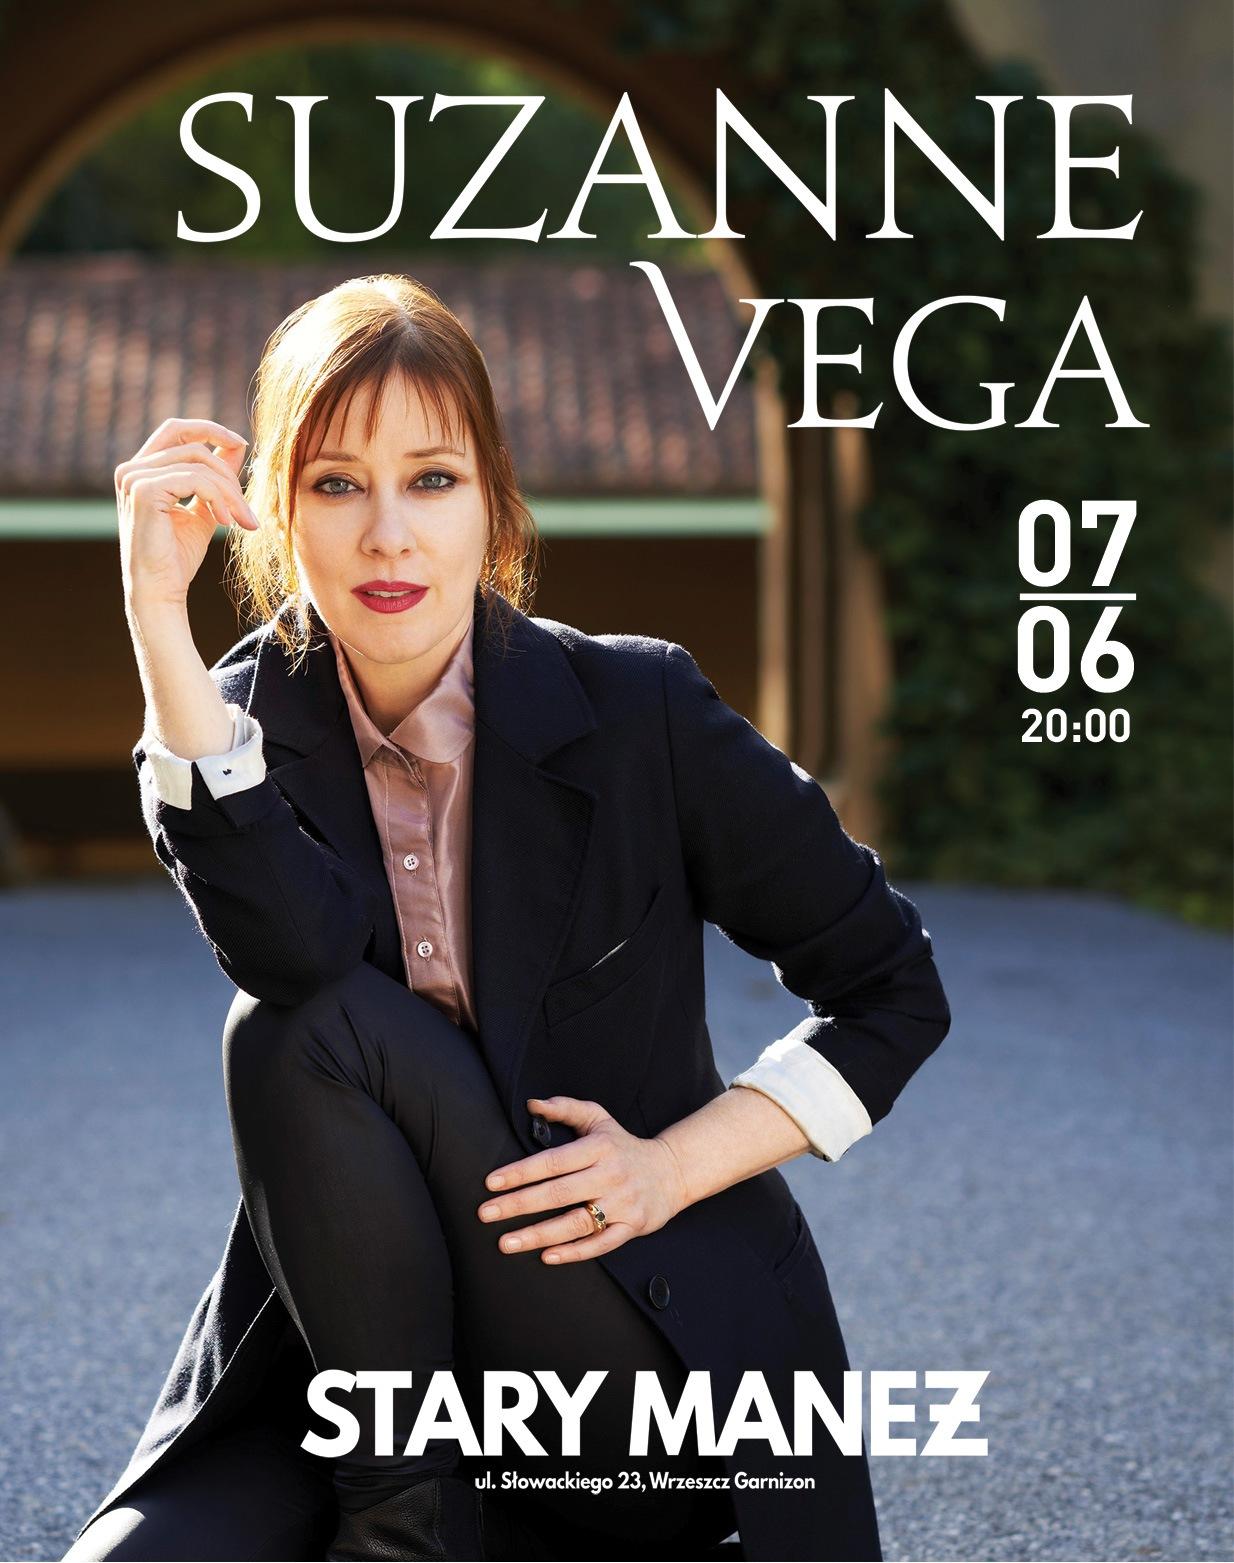 Suzanne Vega (źródło: materiały prasowe organizatora)